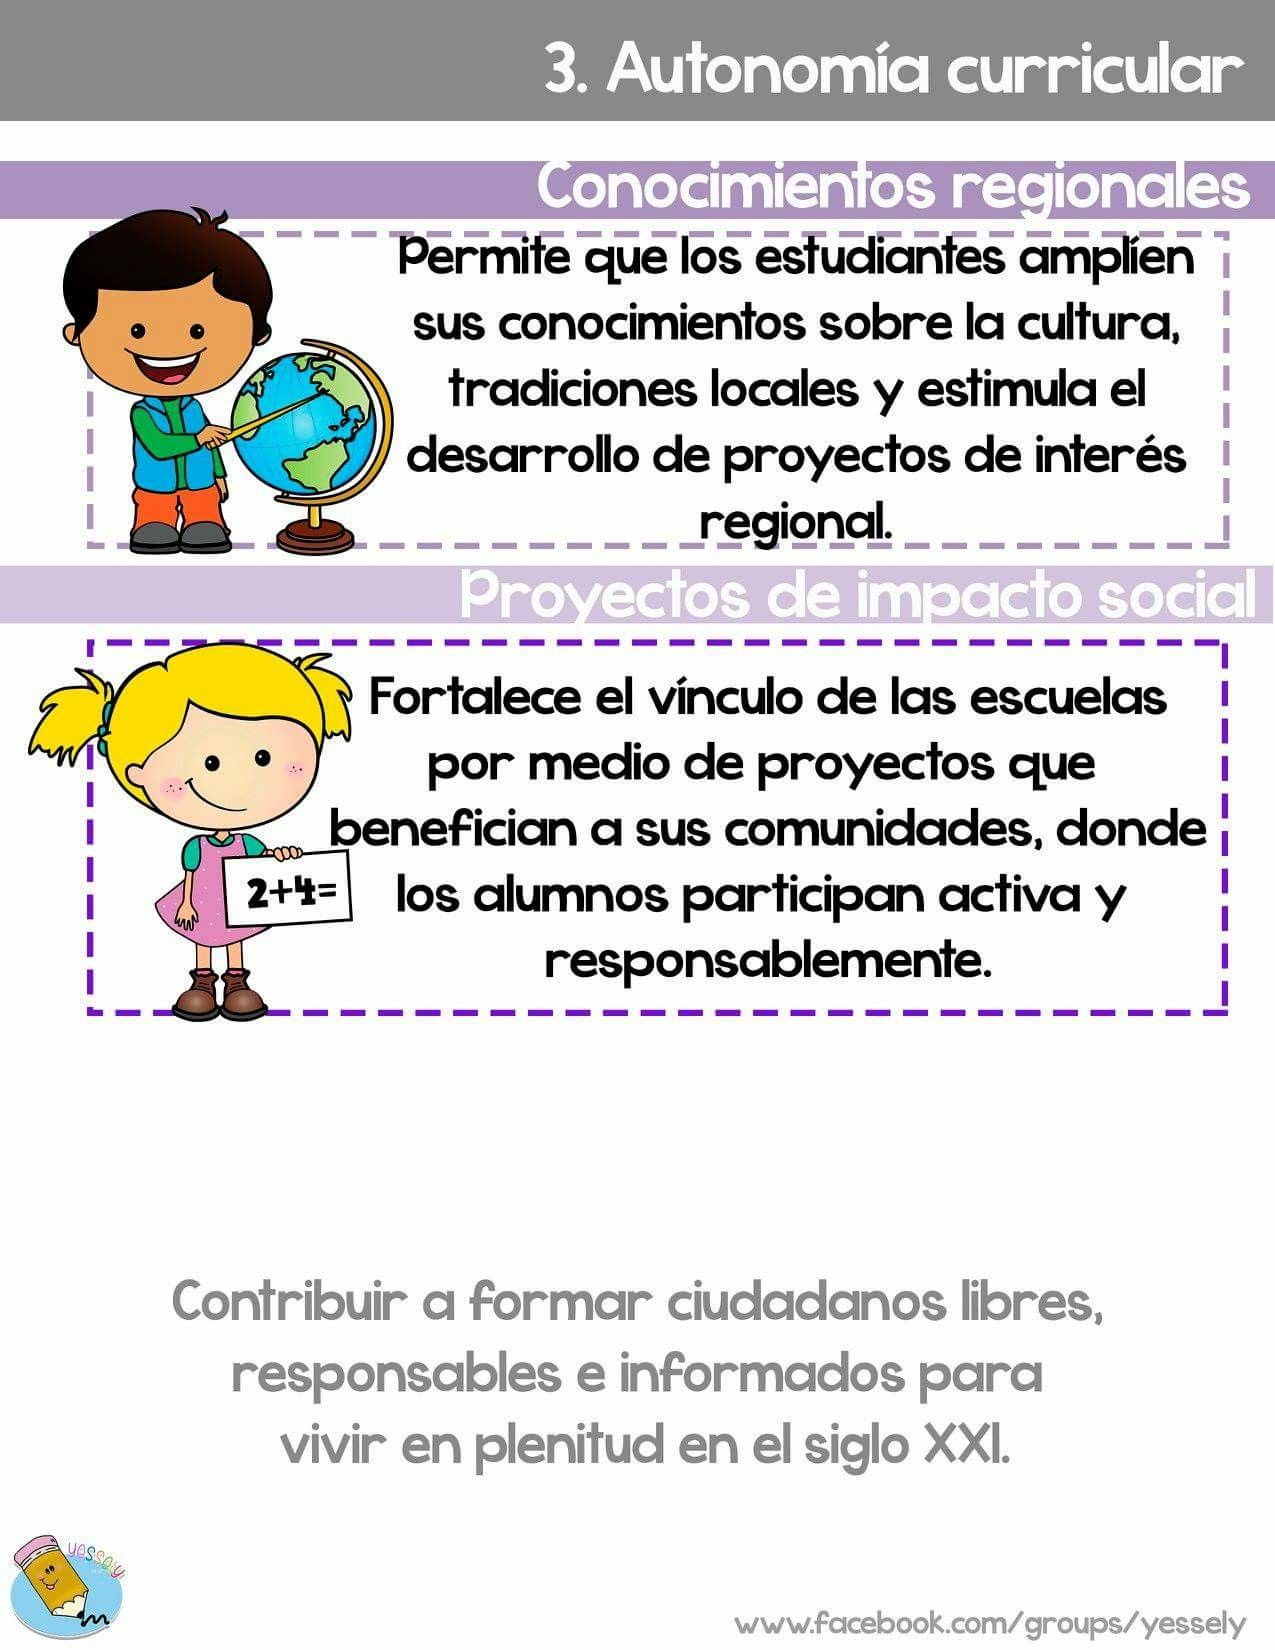 Pin de Cony Moib en Educacion | Pinterest | Aprendizaje, Preescolar ...